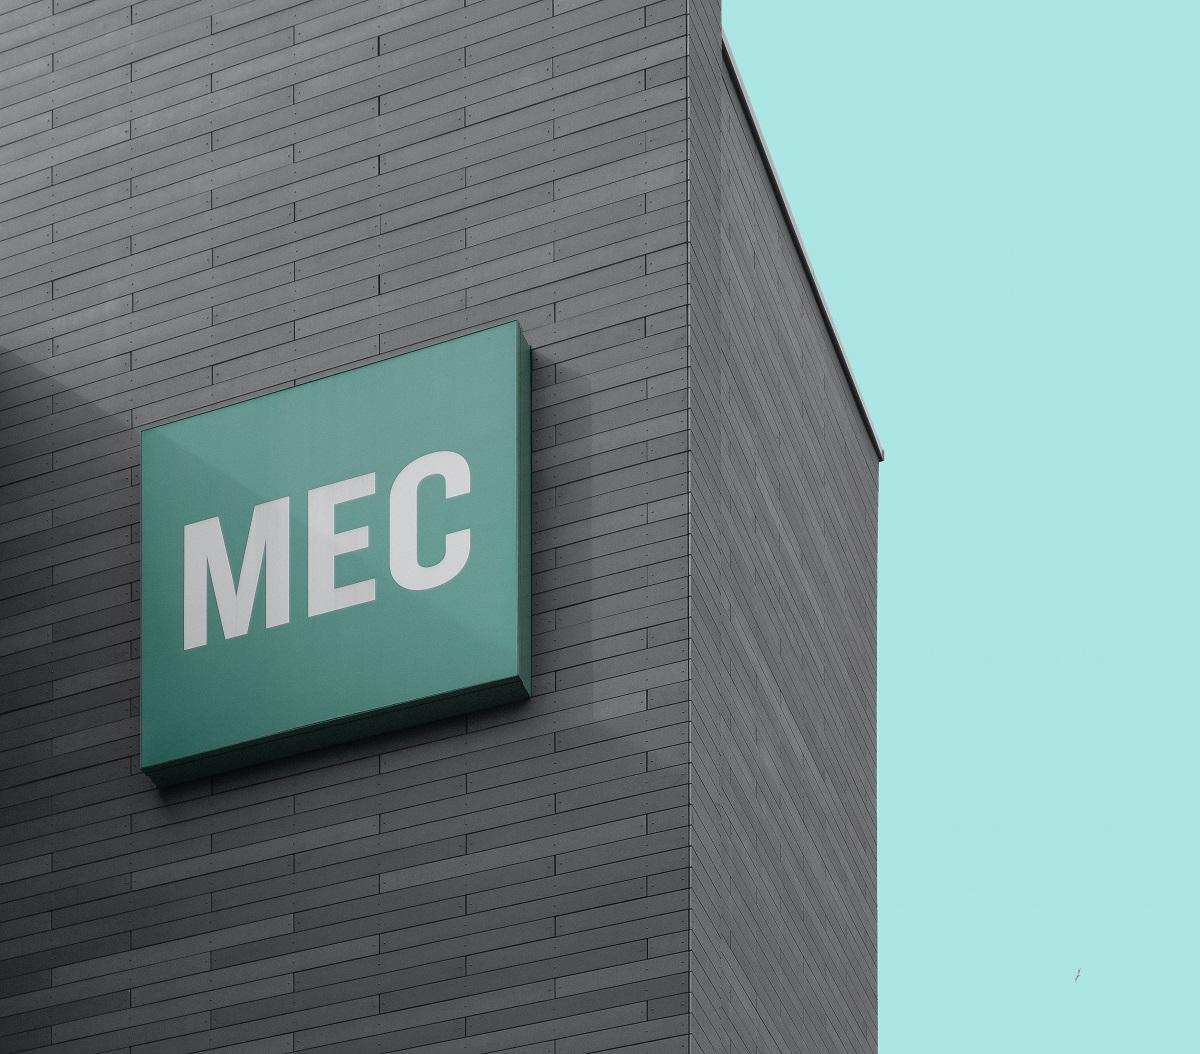 MEC logo on building